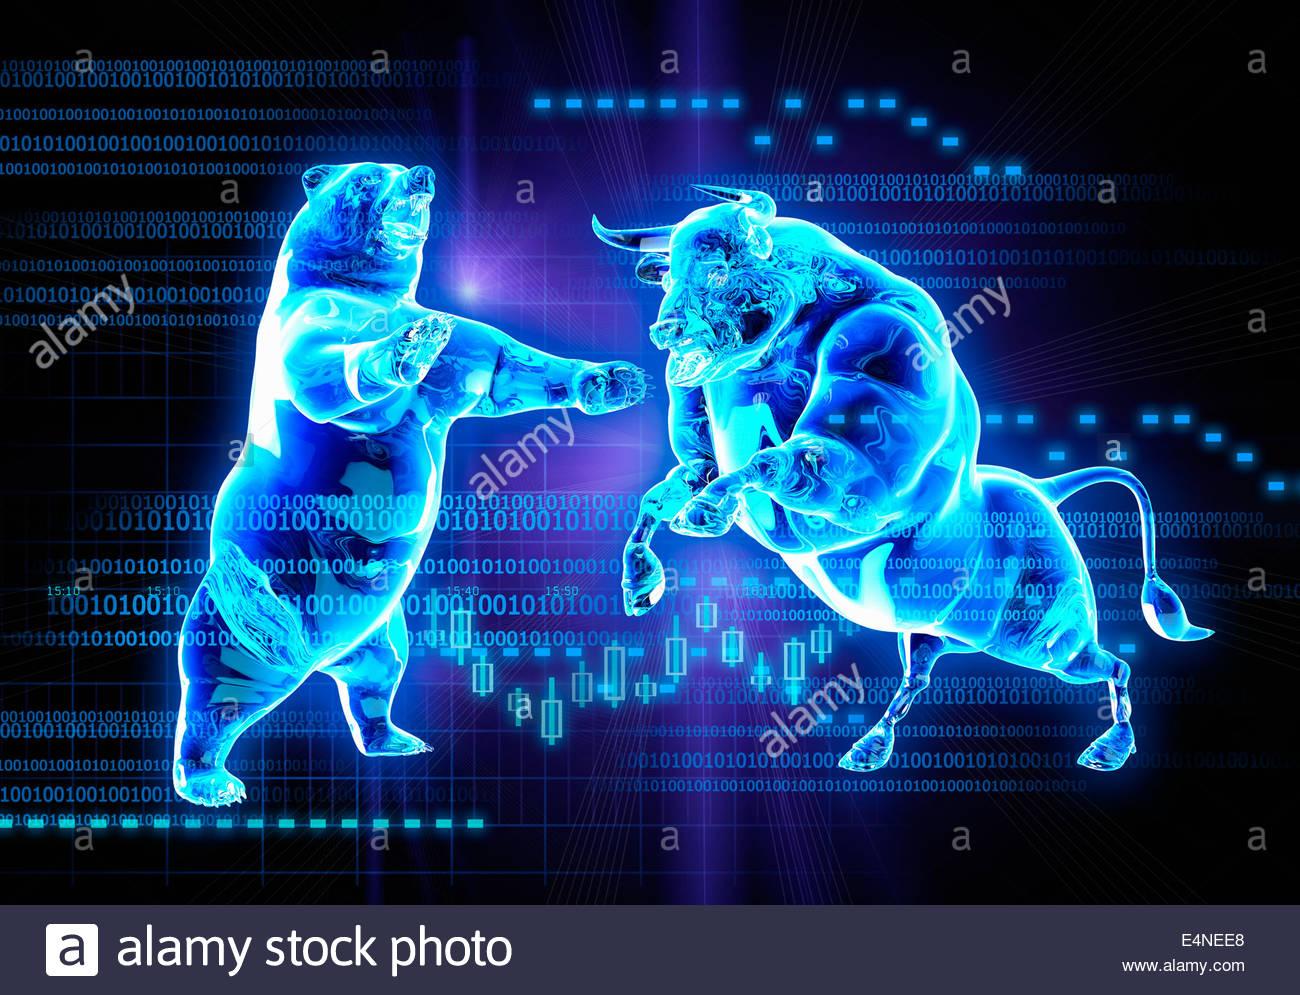 stock market animal symbols stock photos stock market animal